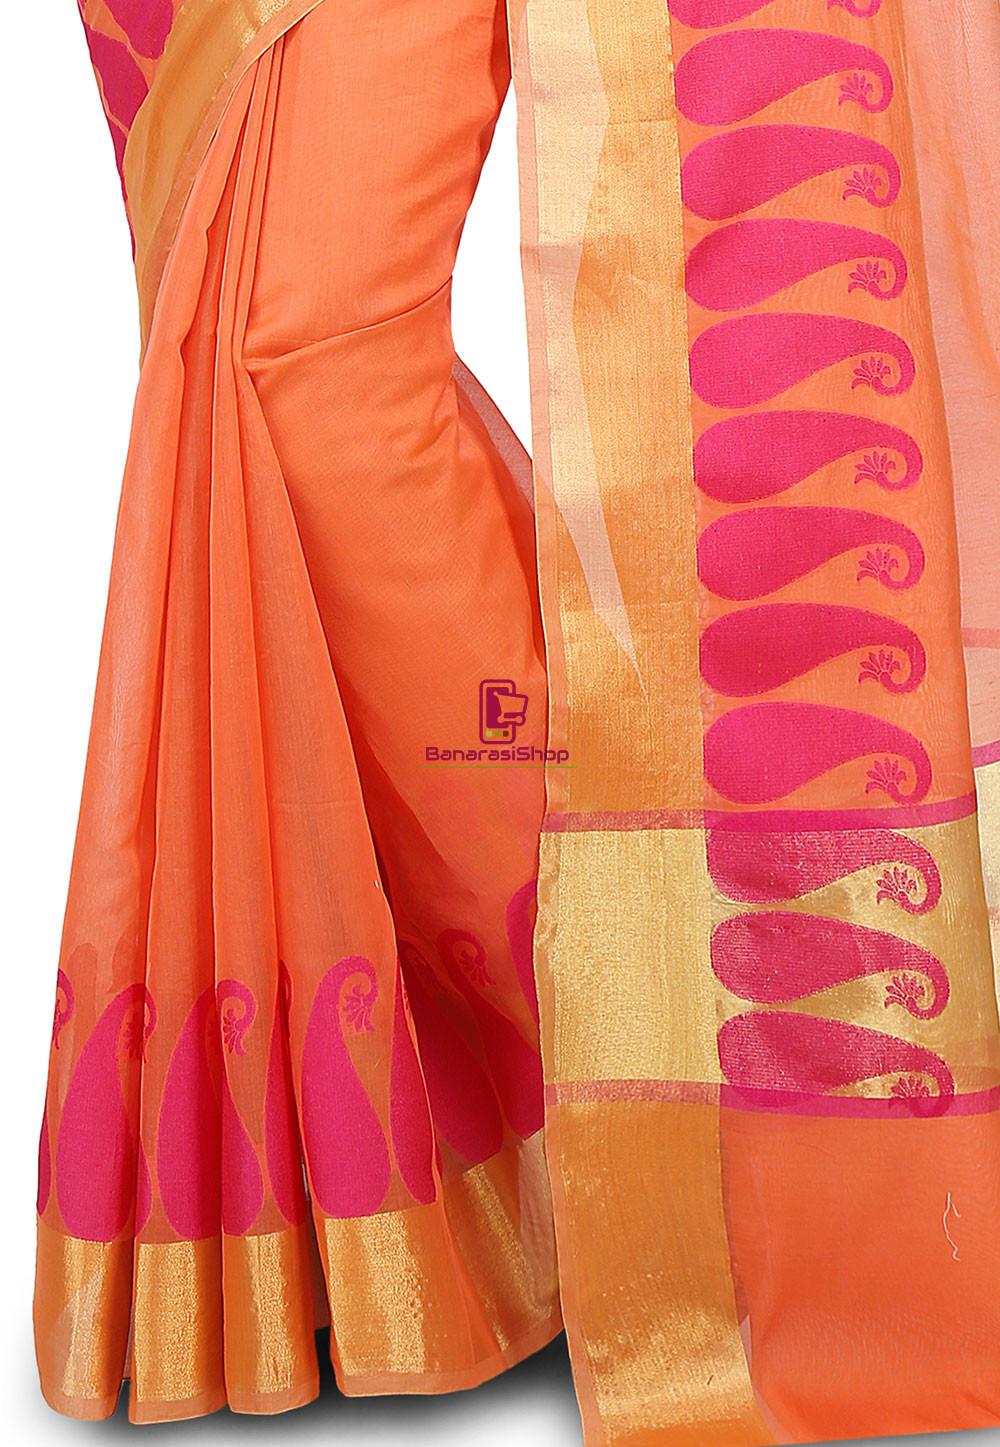 Woven Banarasi Chanderi Cotton Saree in Orange 3